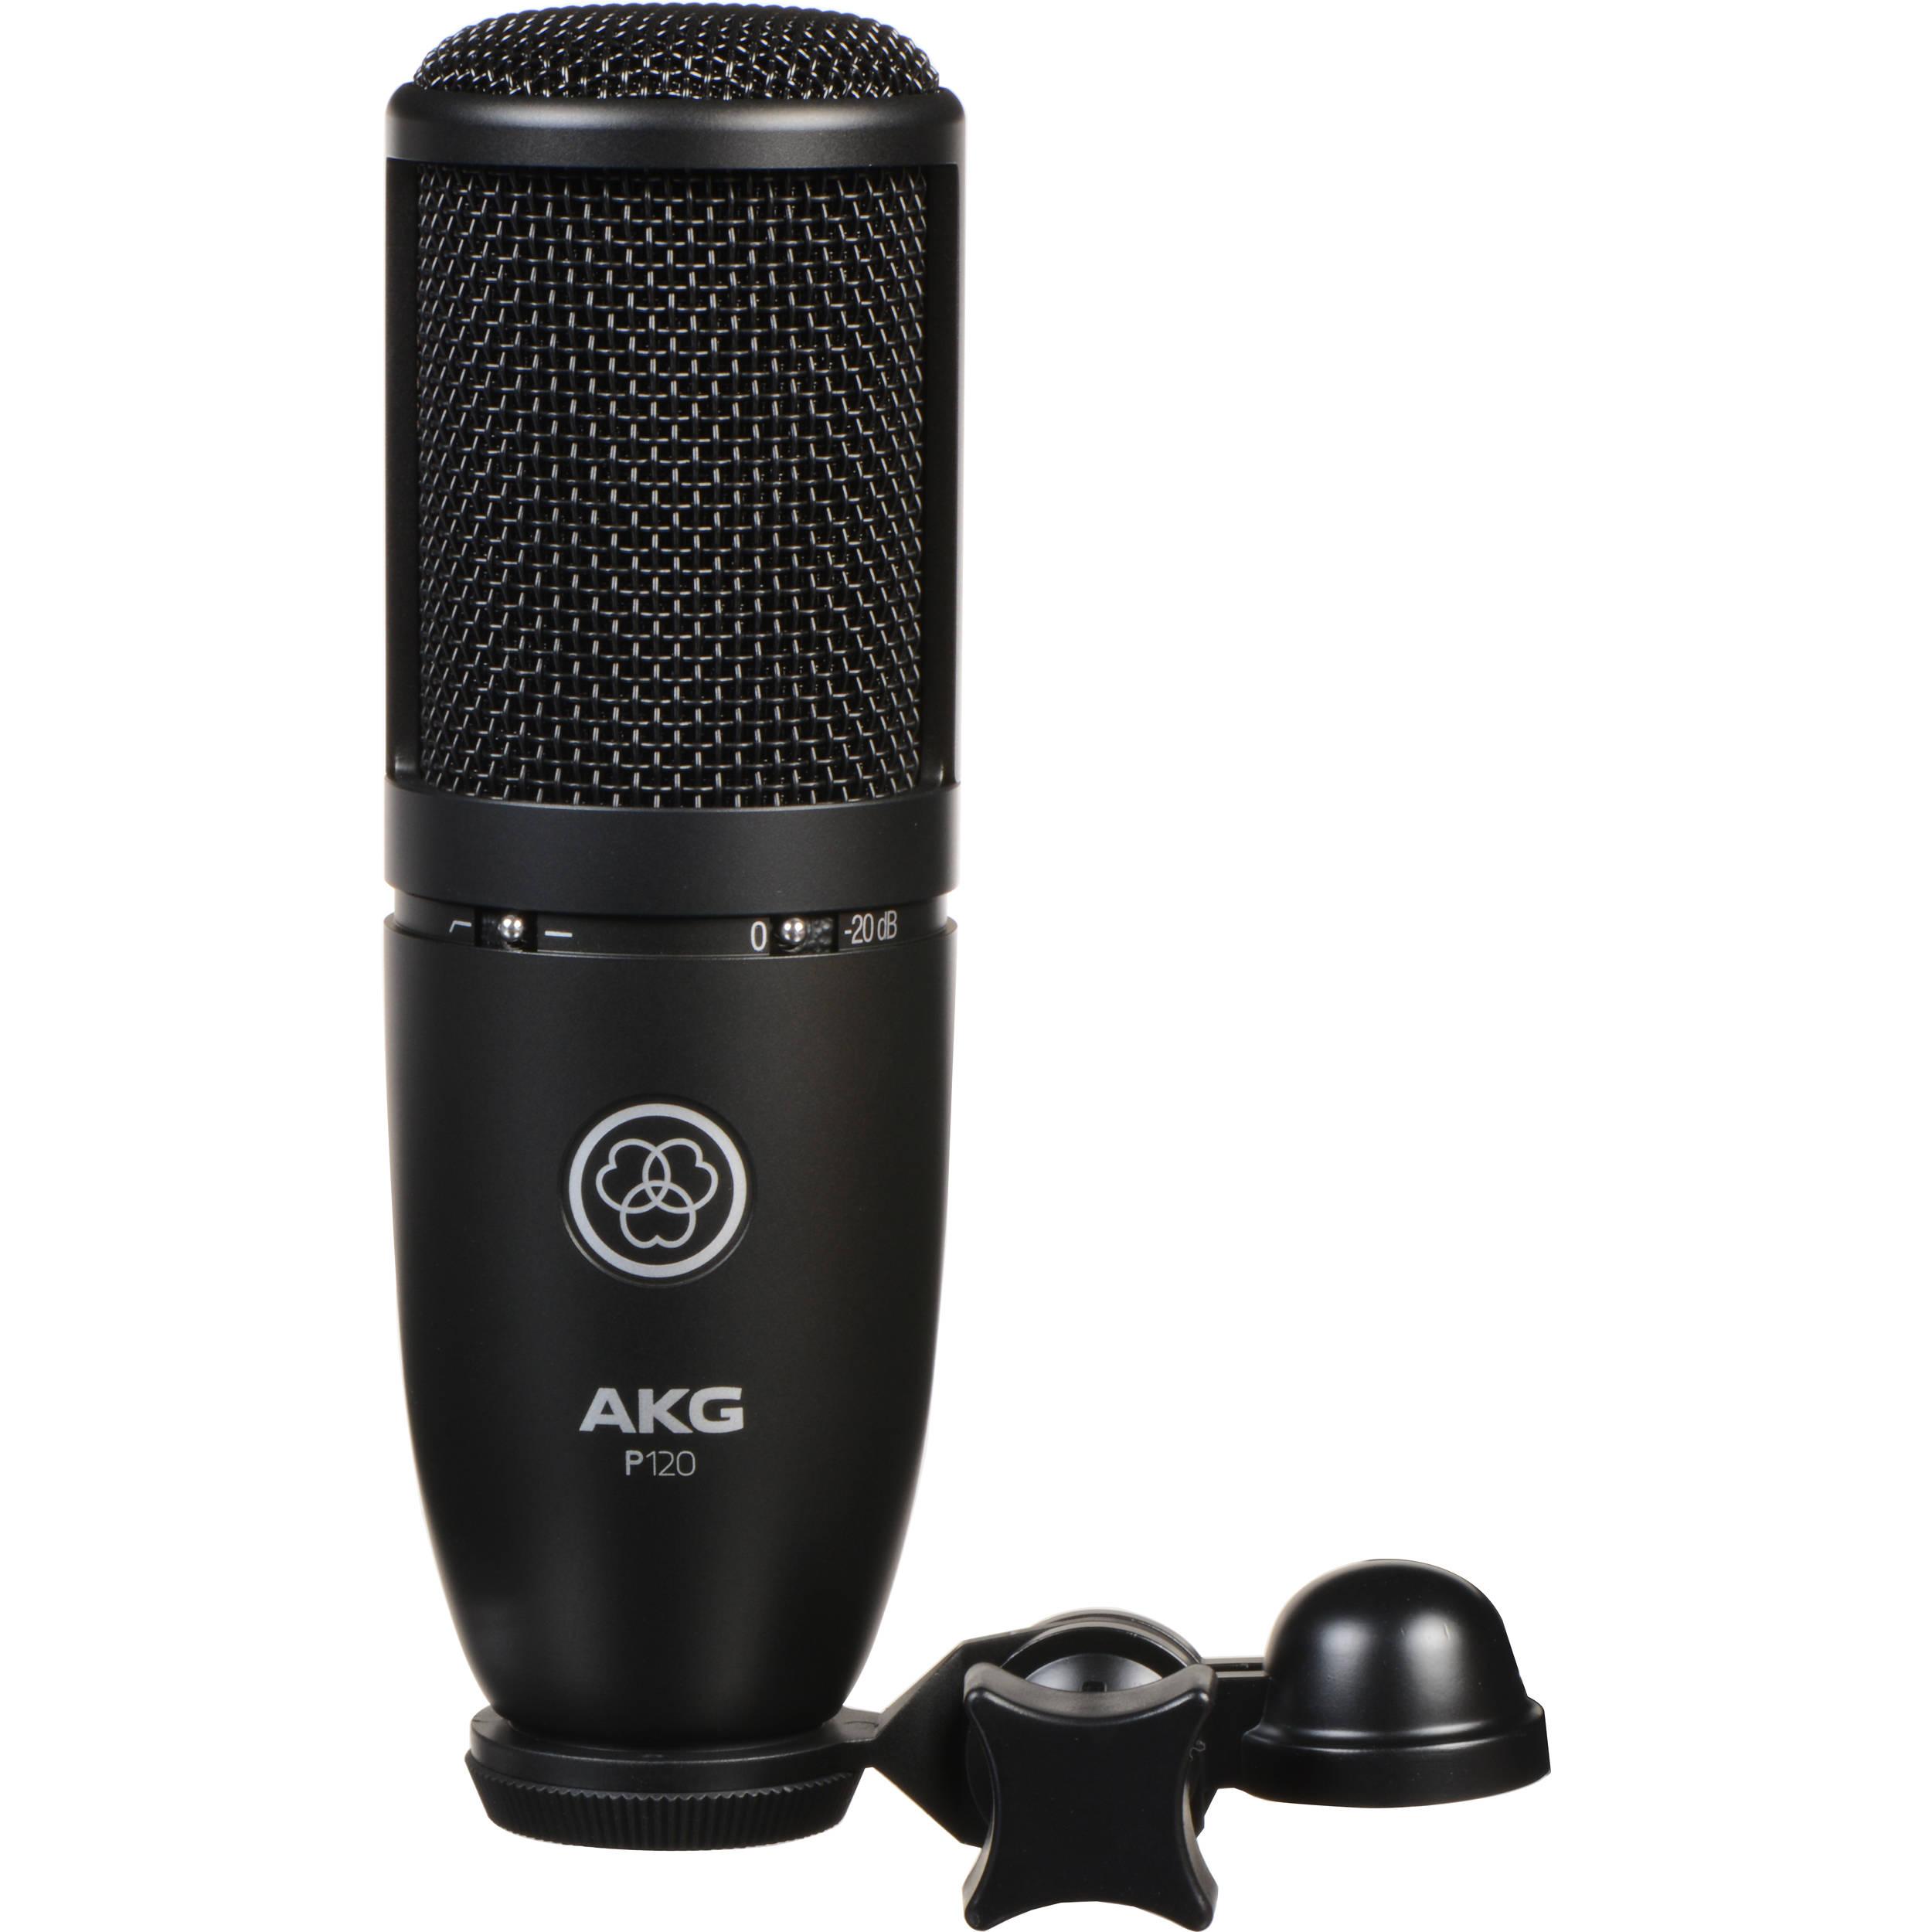 AKG P120 Cardioid Condenser Microphone (Black) 3101H00400 B&H